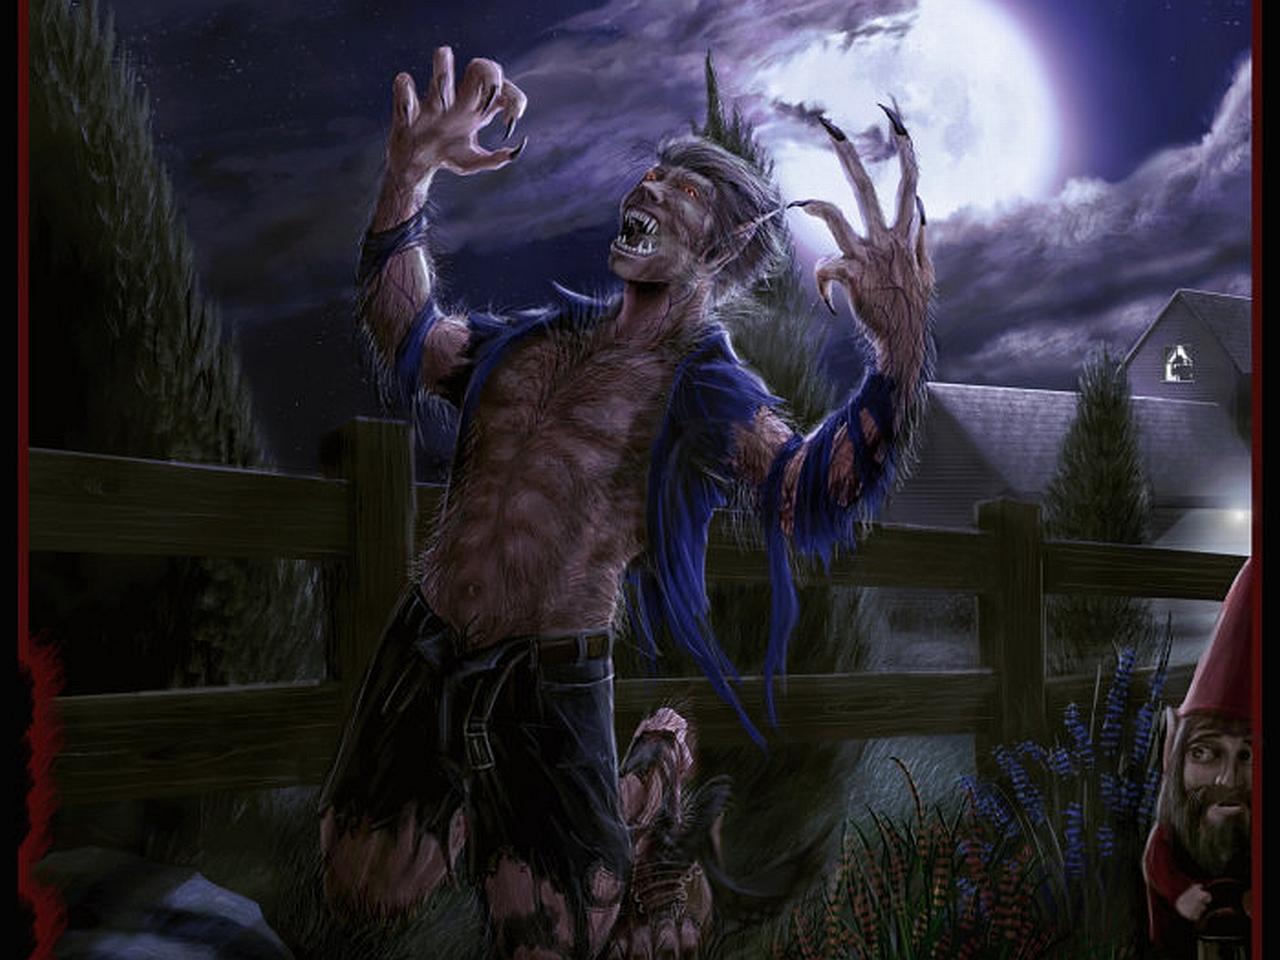 Werewolf Wallpapers For Halloween 1280x960